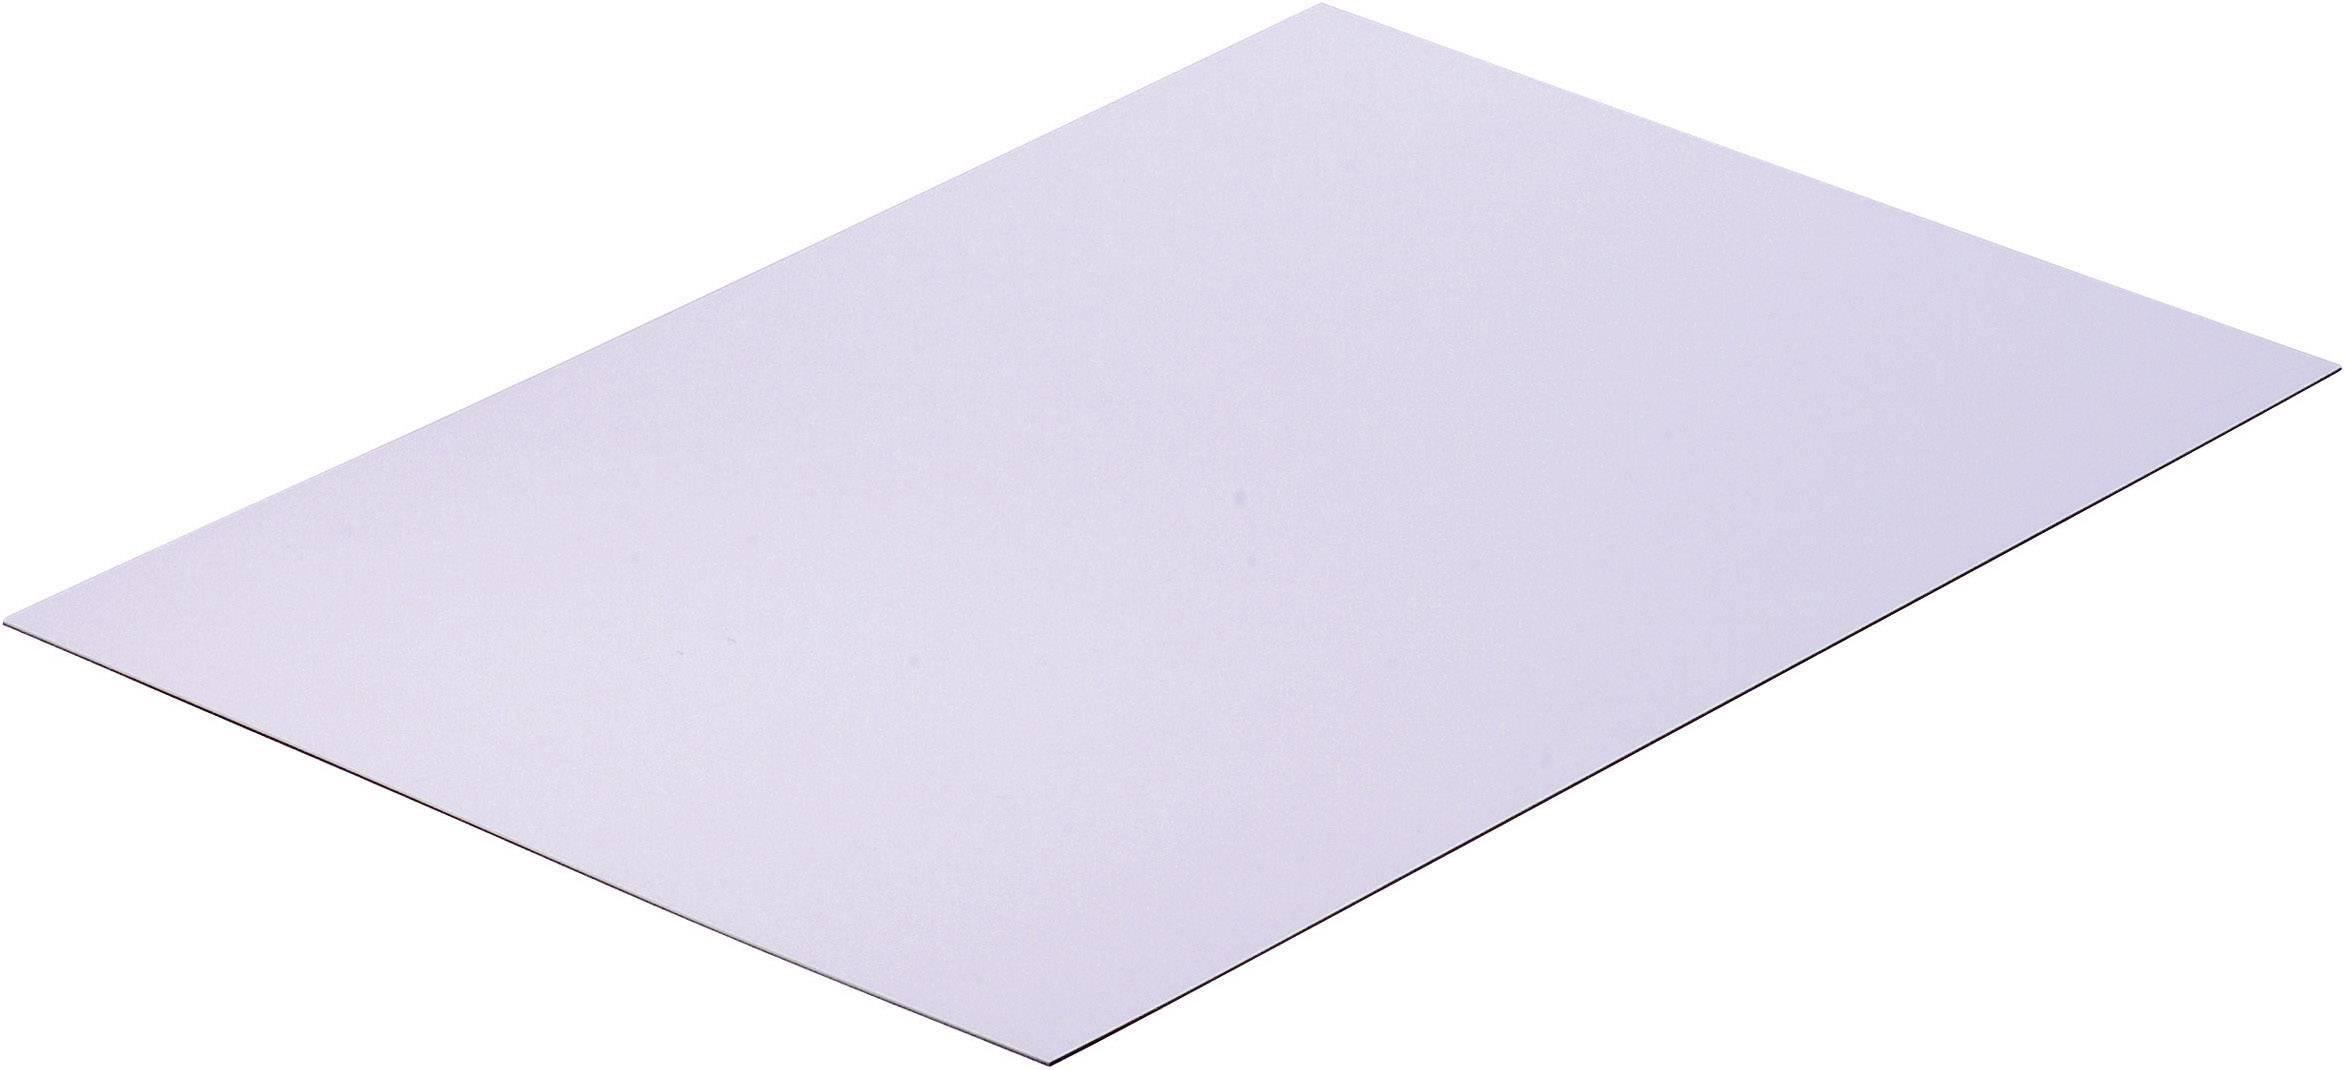 Polystyrenová deska bílá Modelcraft, 330 x 230 x 1,5 mm